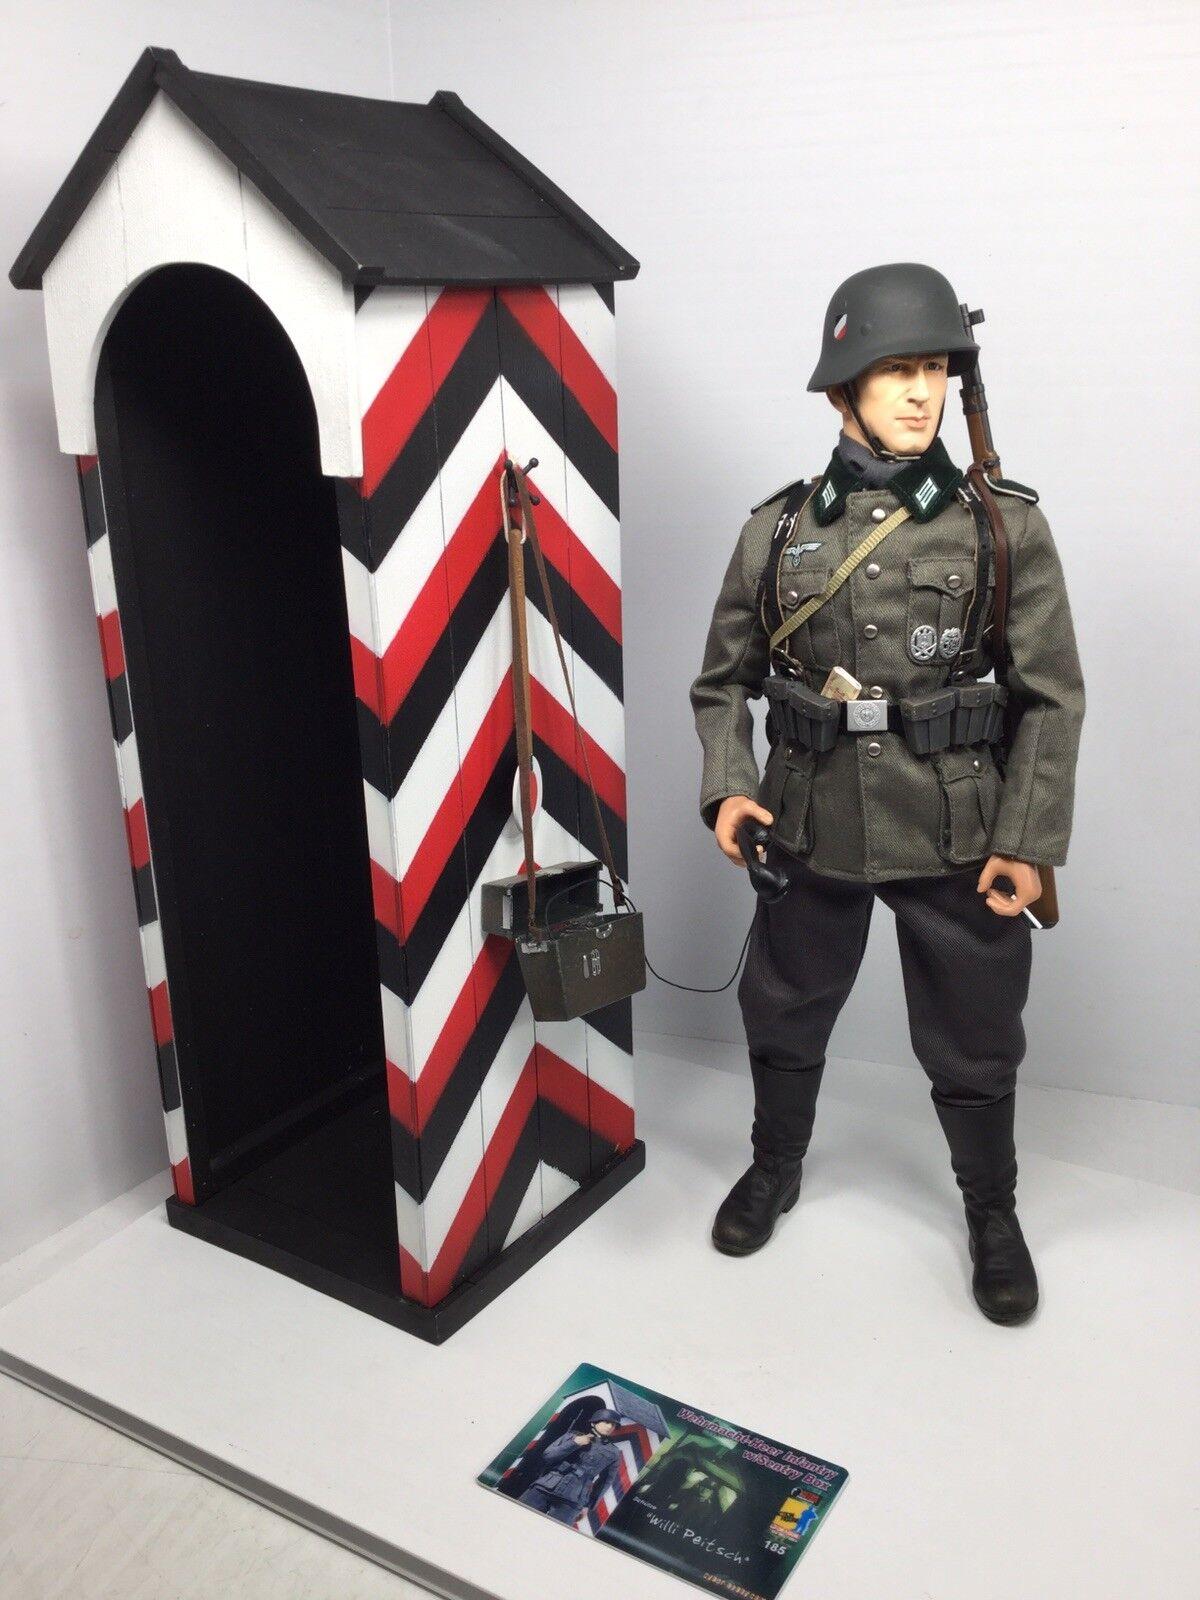 1 6 DRAGON GERMAN WEHRMACHT SENTRY & SENTRY HUT +TELEPHONE K-98 WW2 BBI DID 21st